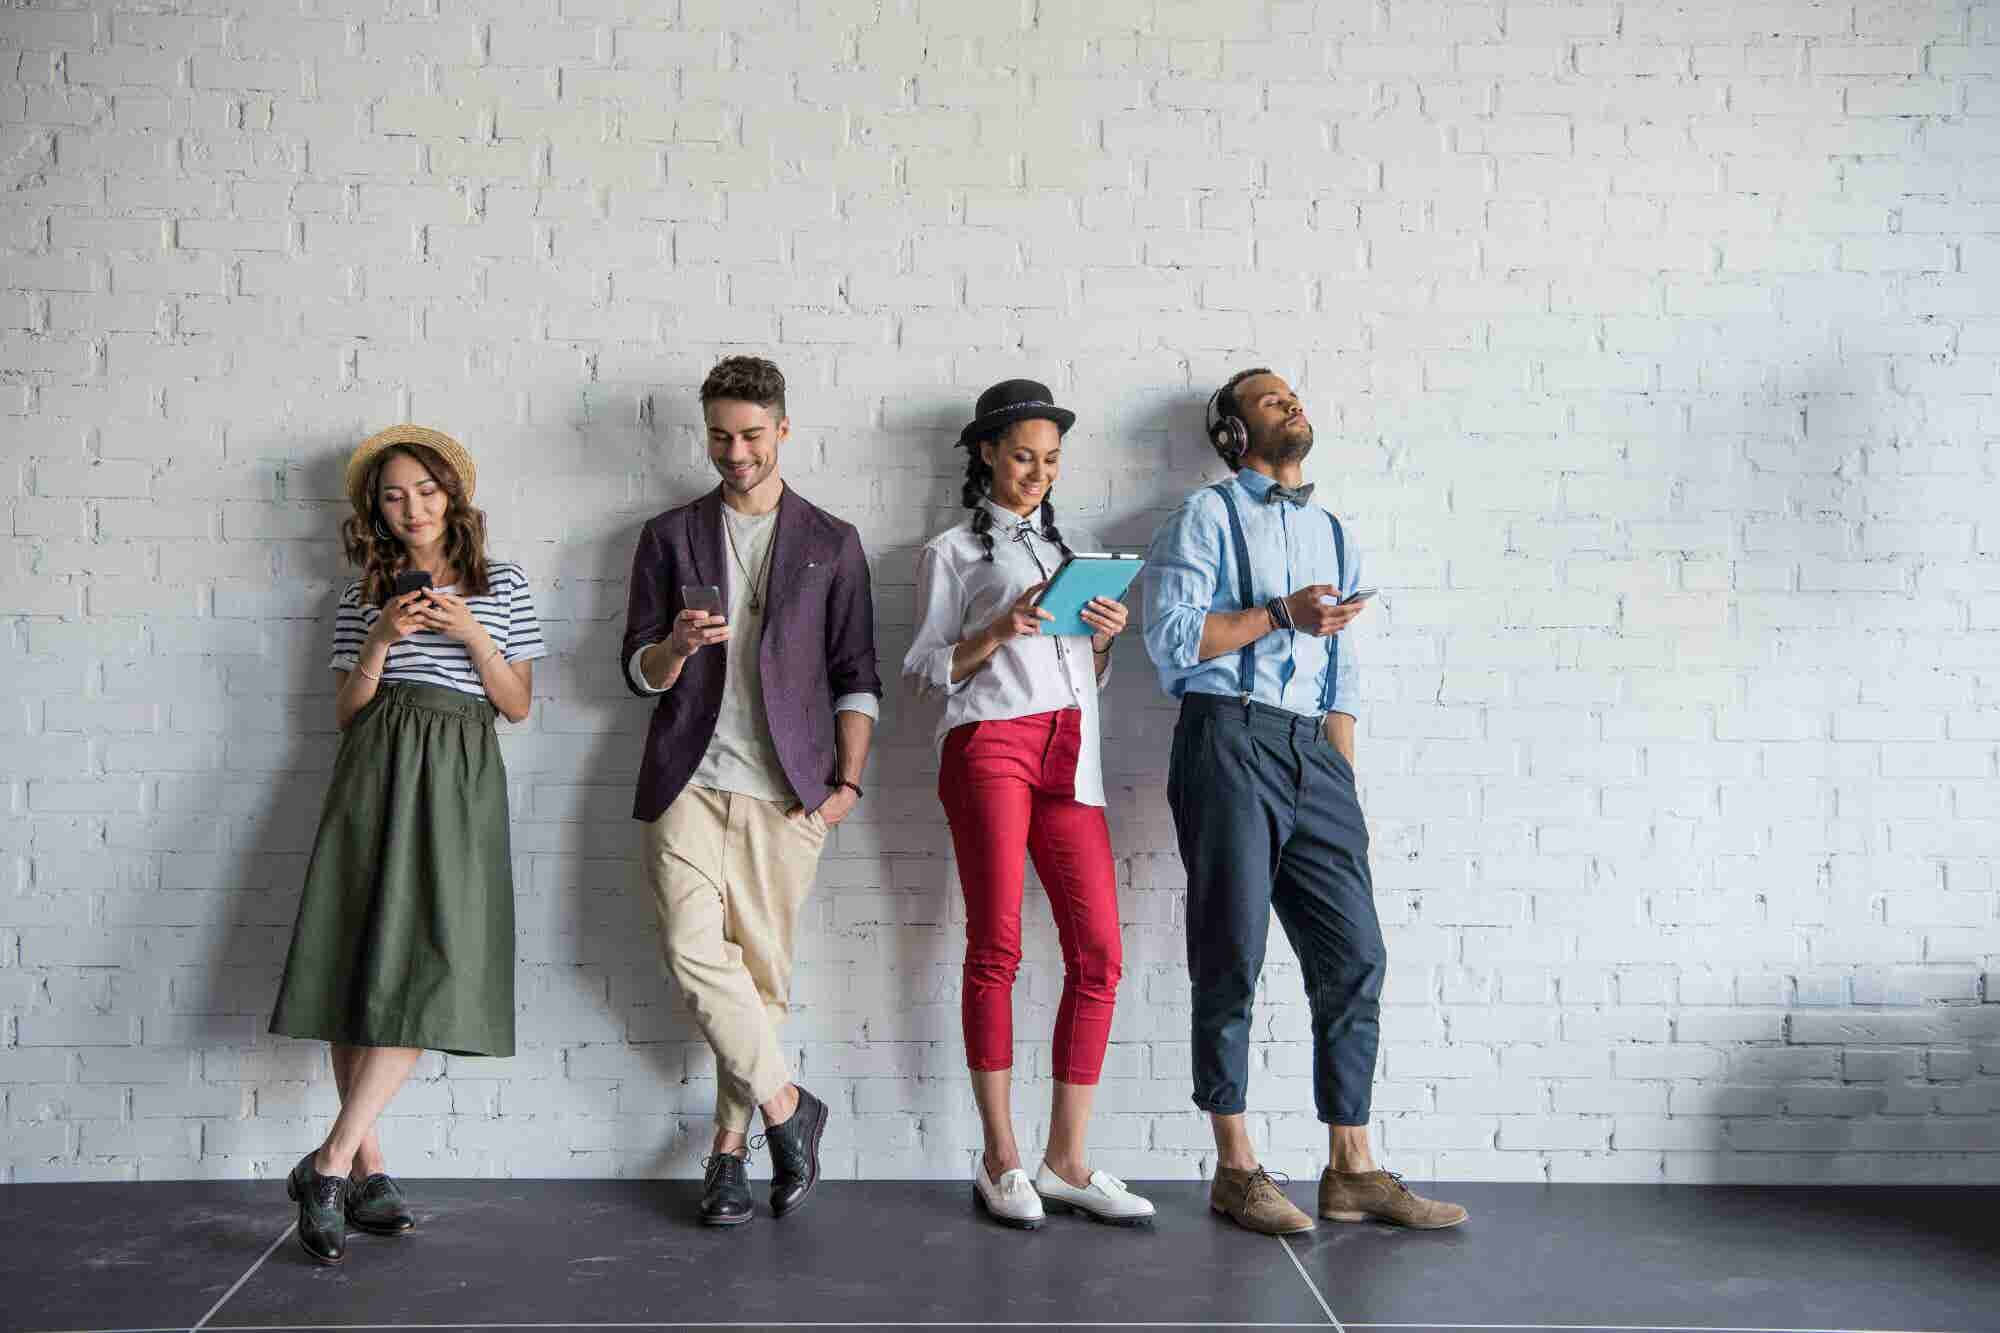 12 formas de conectarte con tus empleados millennial